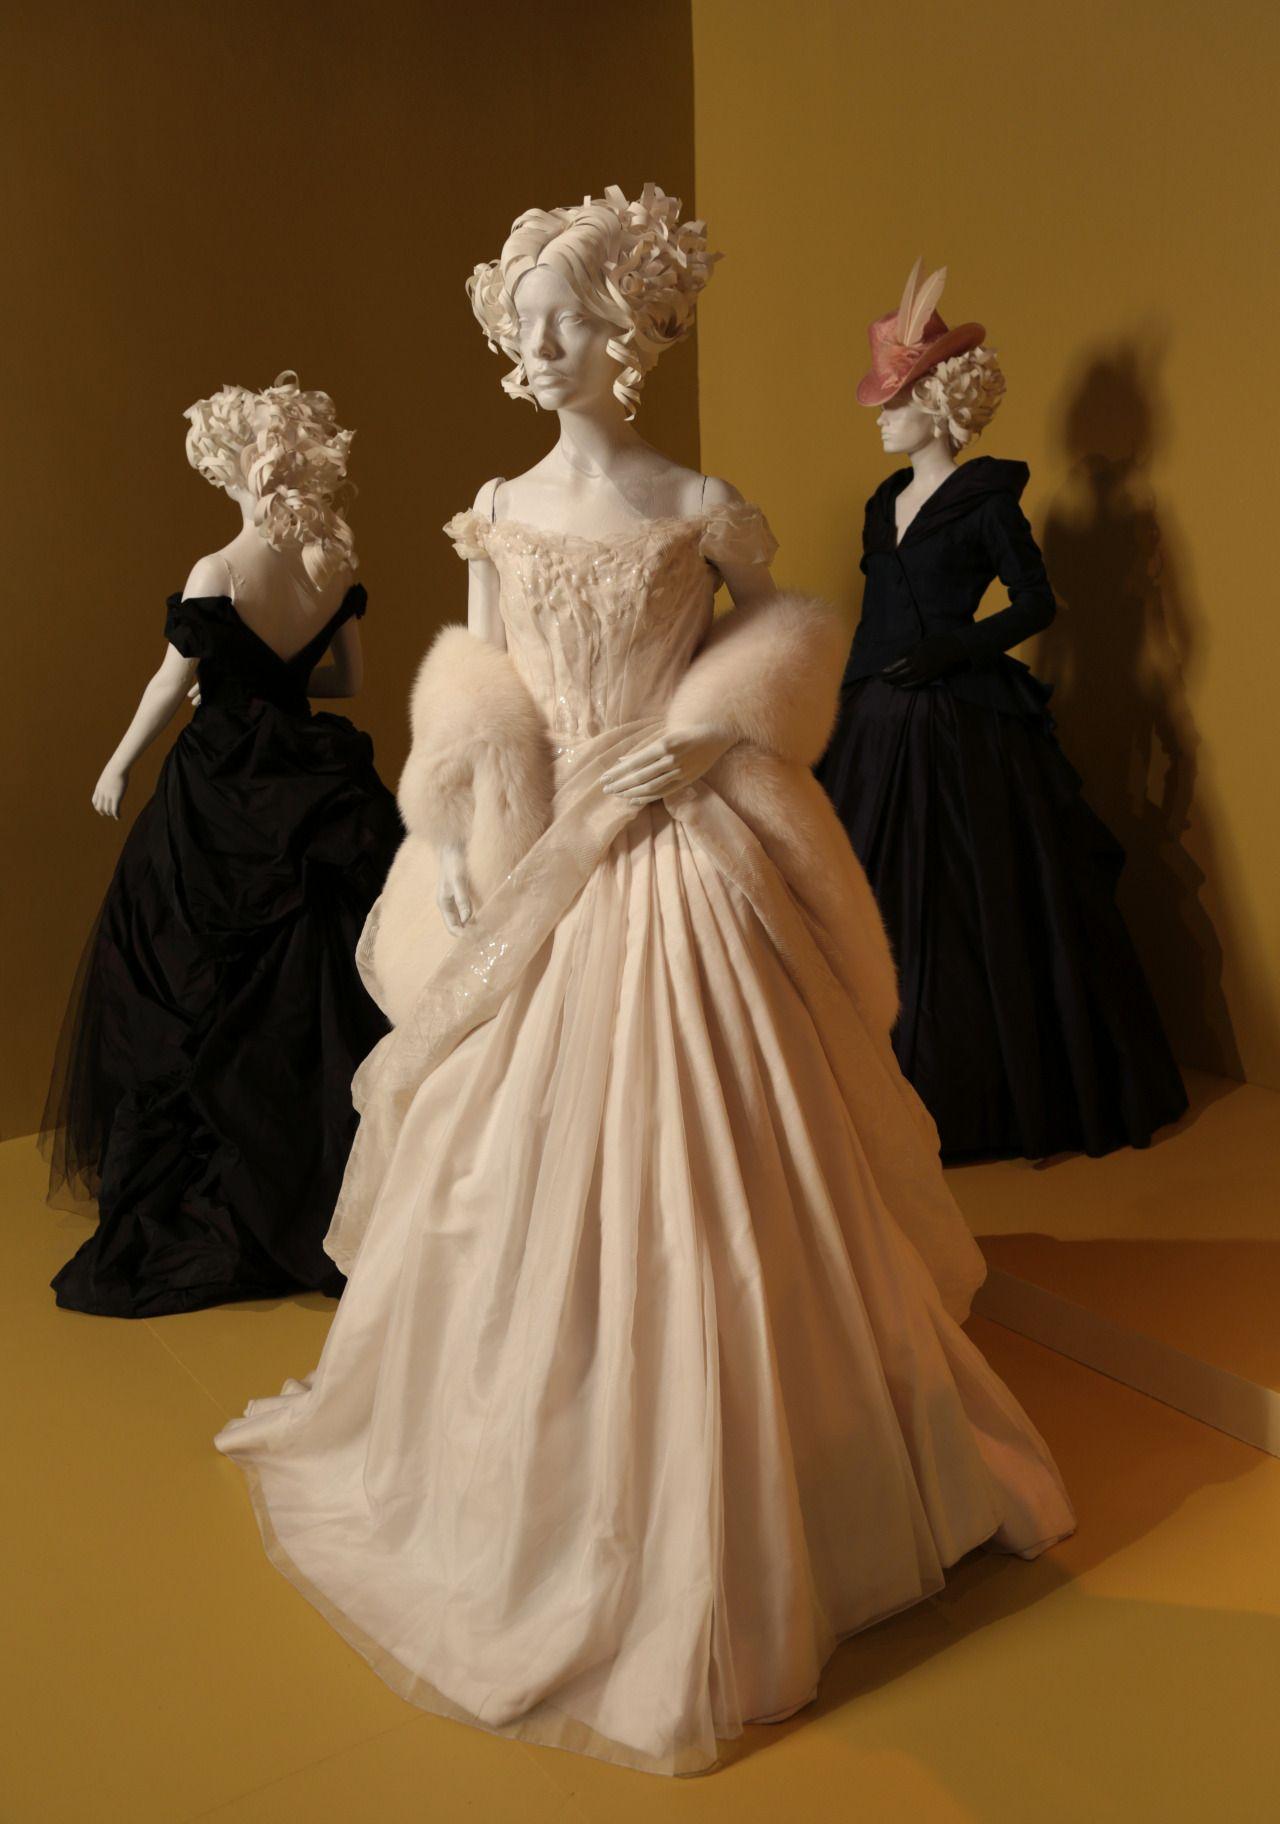 Anna Karenina 2012 Costumes by Jacqueline Durran Worn by ...